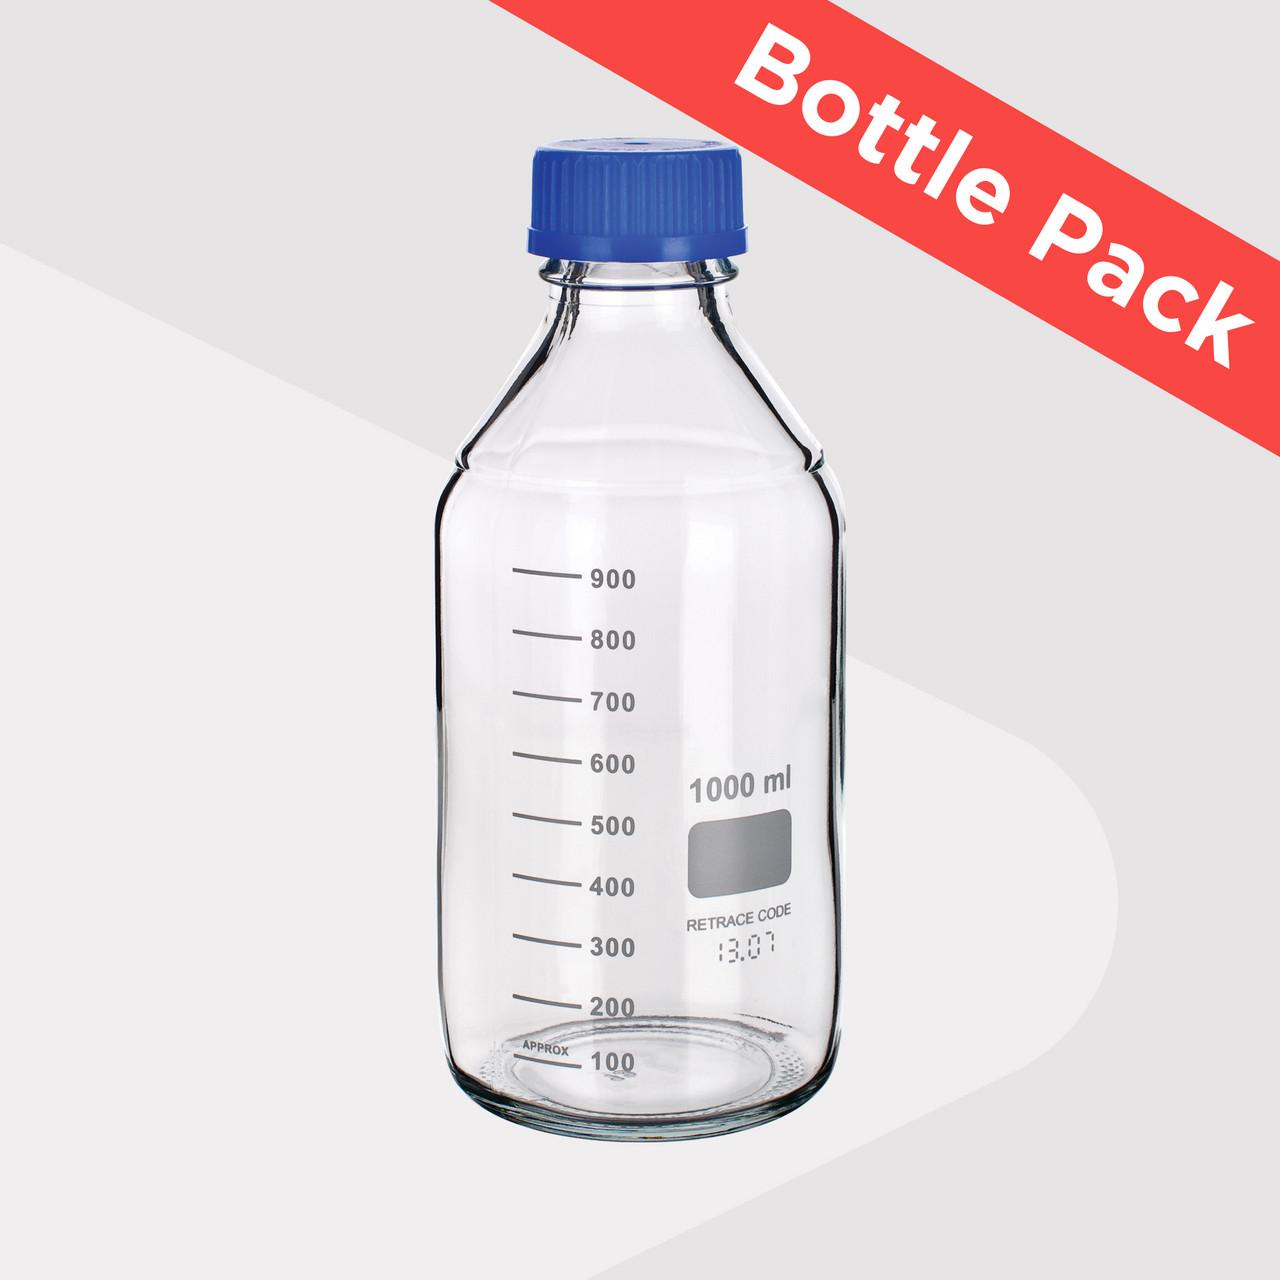 Laboratory Screw Cap Bottles, Clear Borosilicate Glass (Pack of 4 sizes)